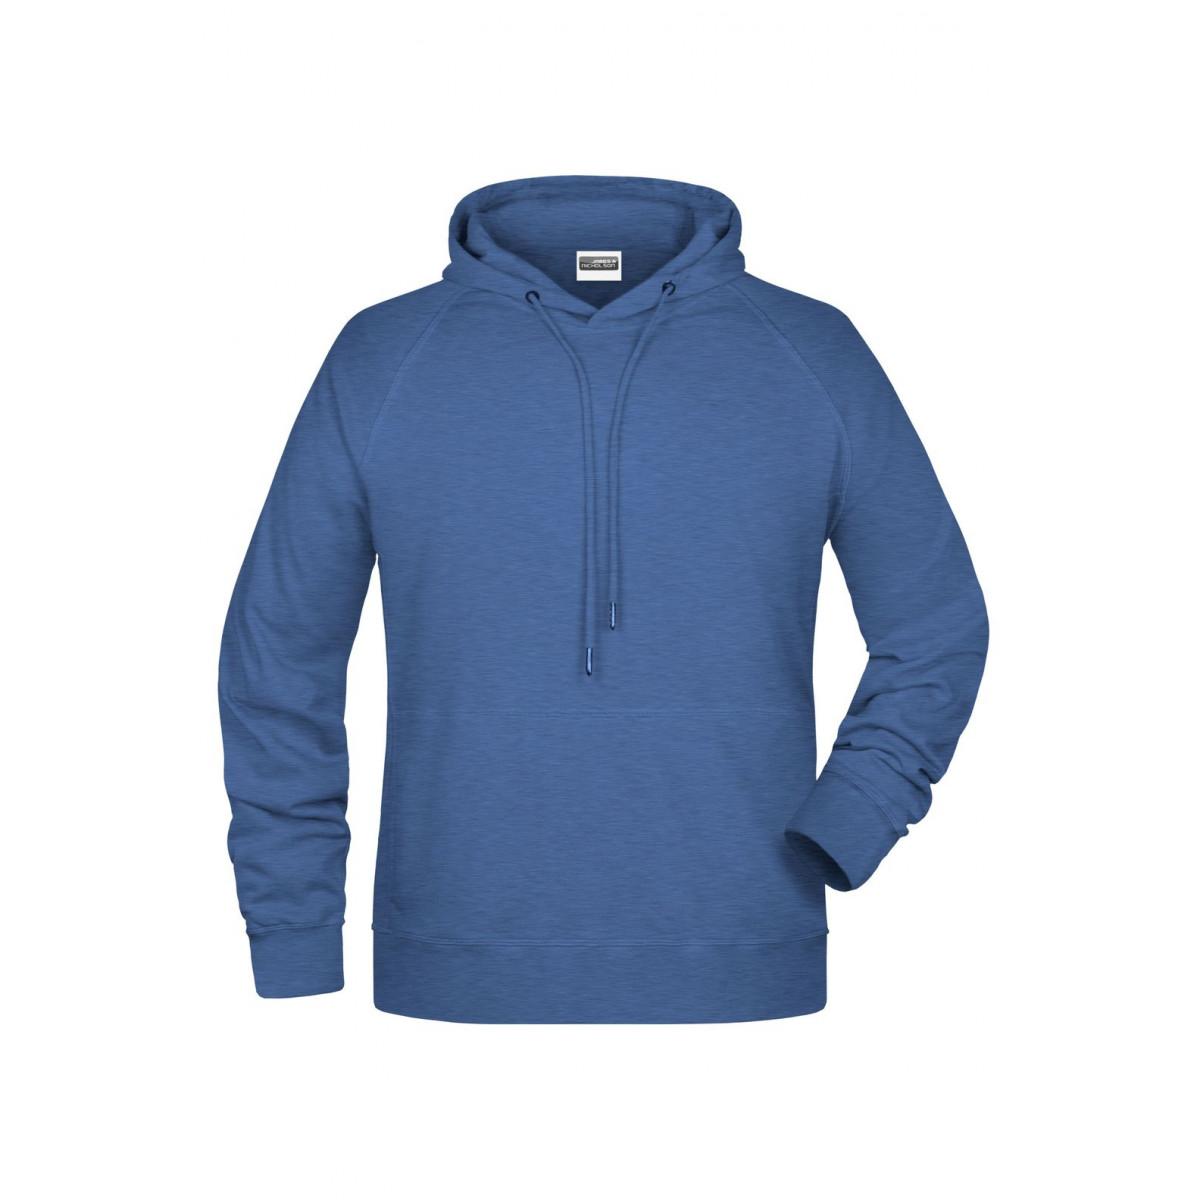 Толстовка мужская 8024 Mens Hoody - Светло-синий меланж